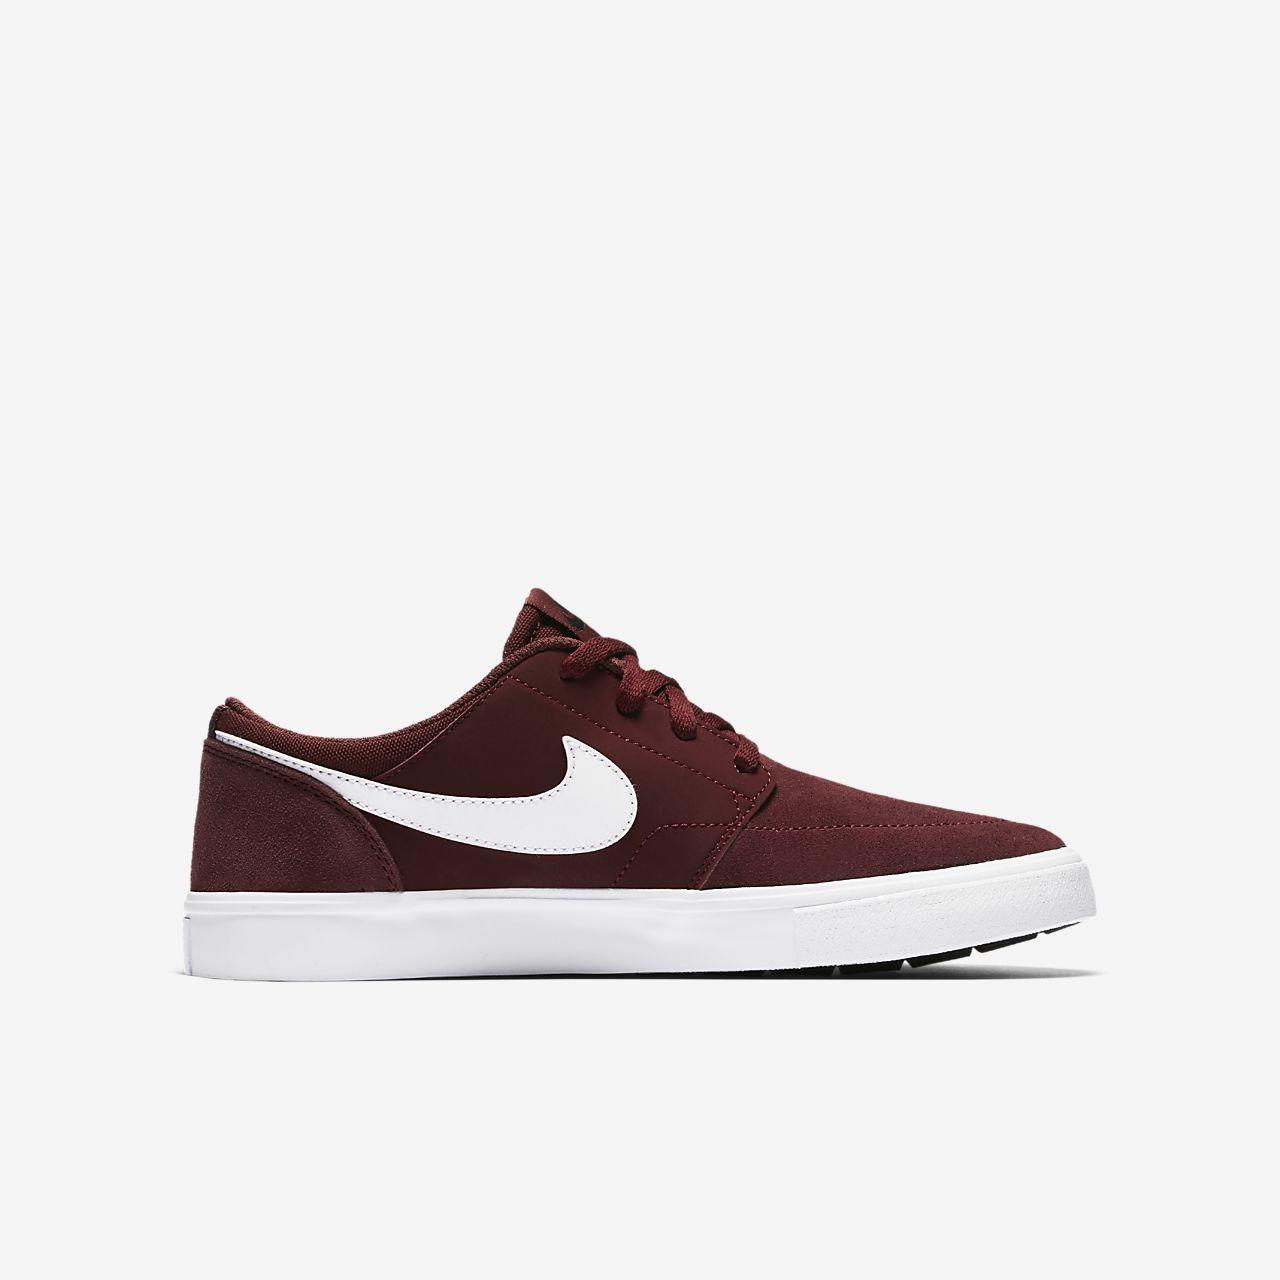 ... Nike SB Portmore II Older Kids' Skateboarding Shoe